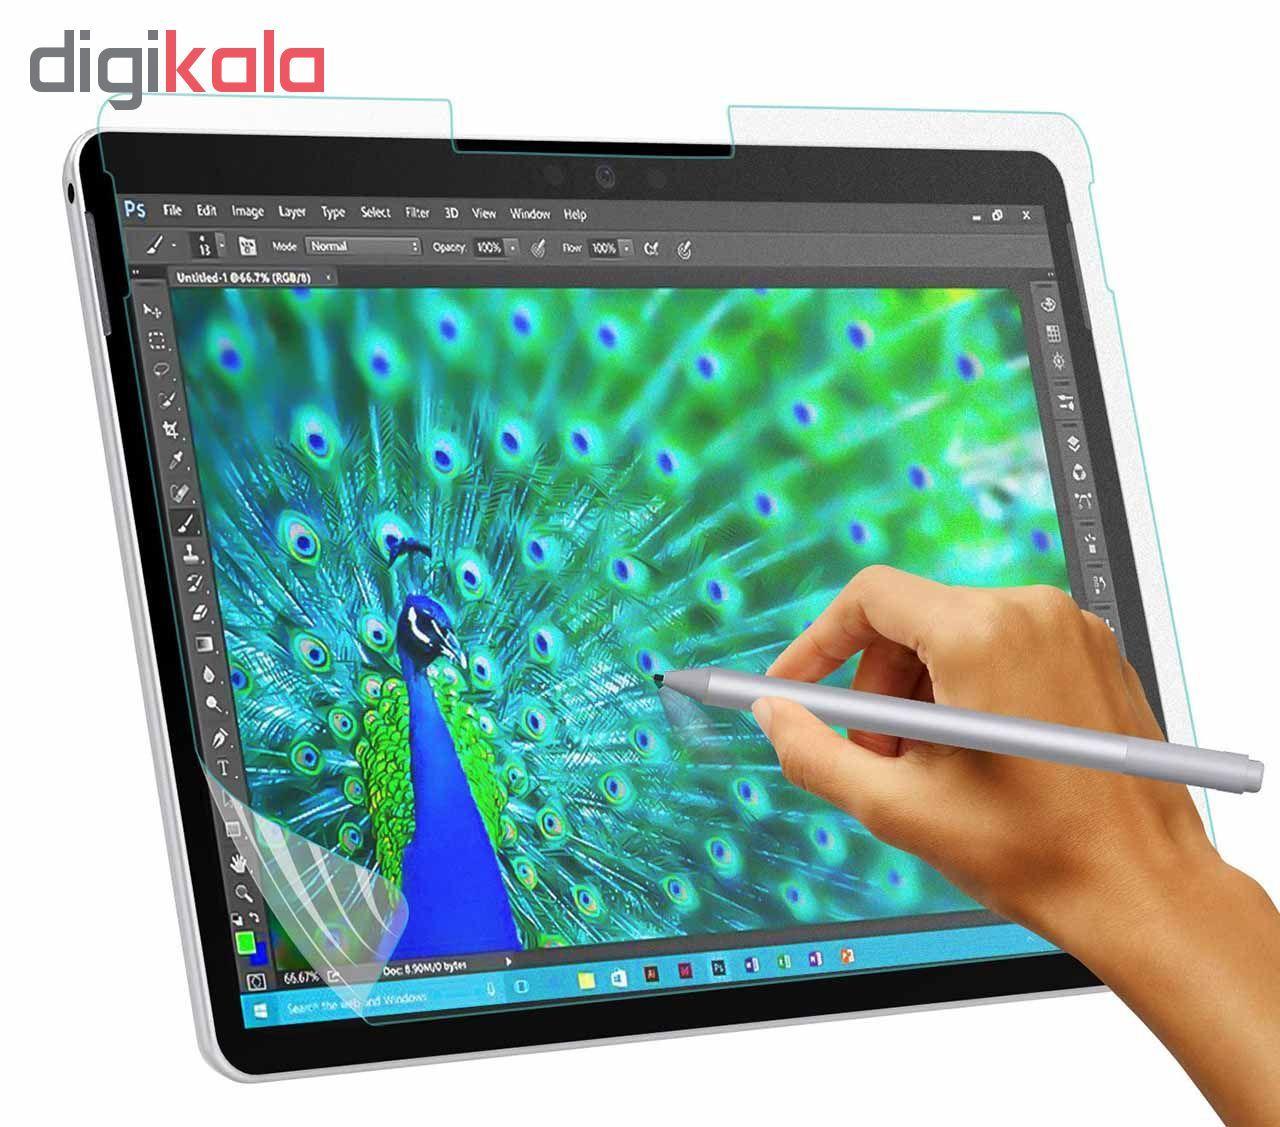 تبلت مایکروسافت مدل Surface Pro 6 - H به همراه کیبورد Signature و قلم main 1 10